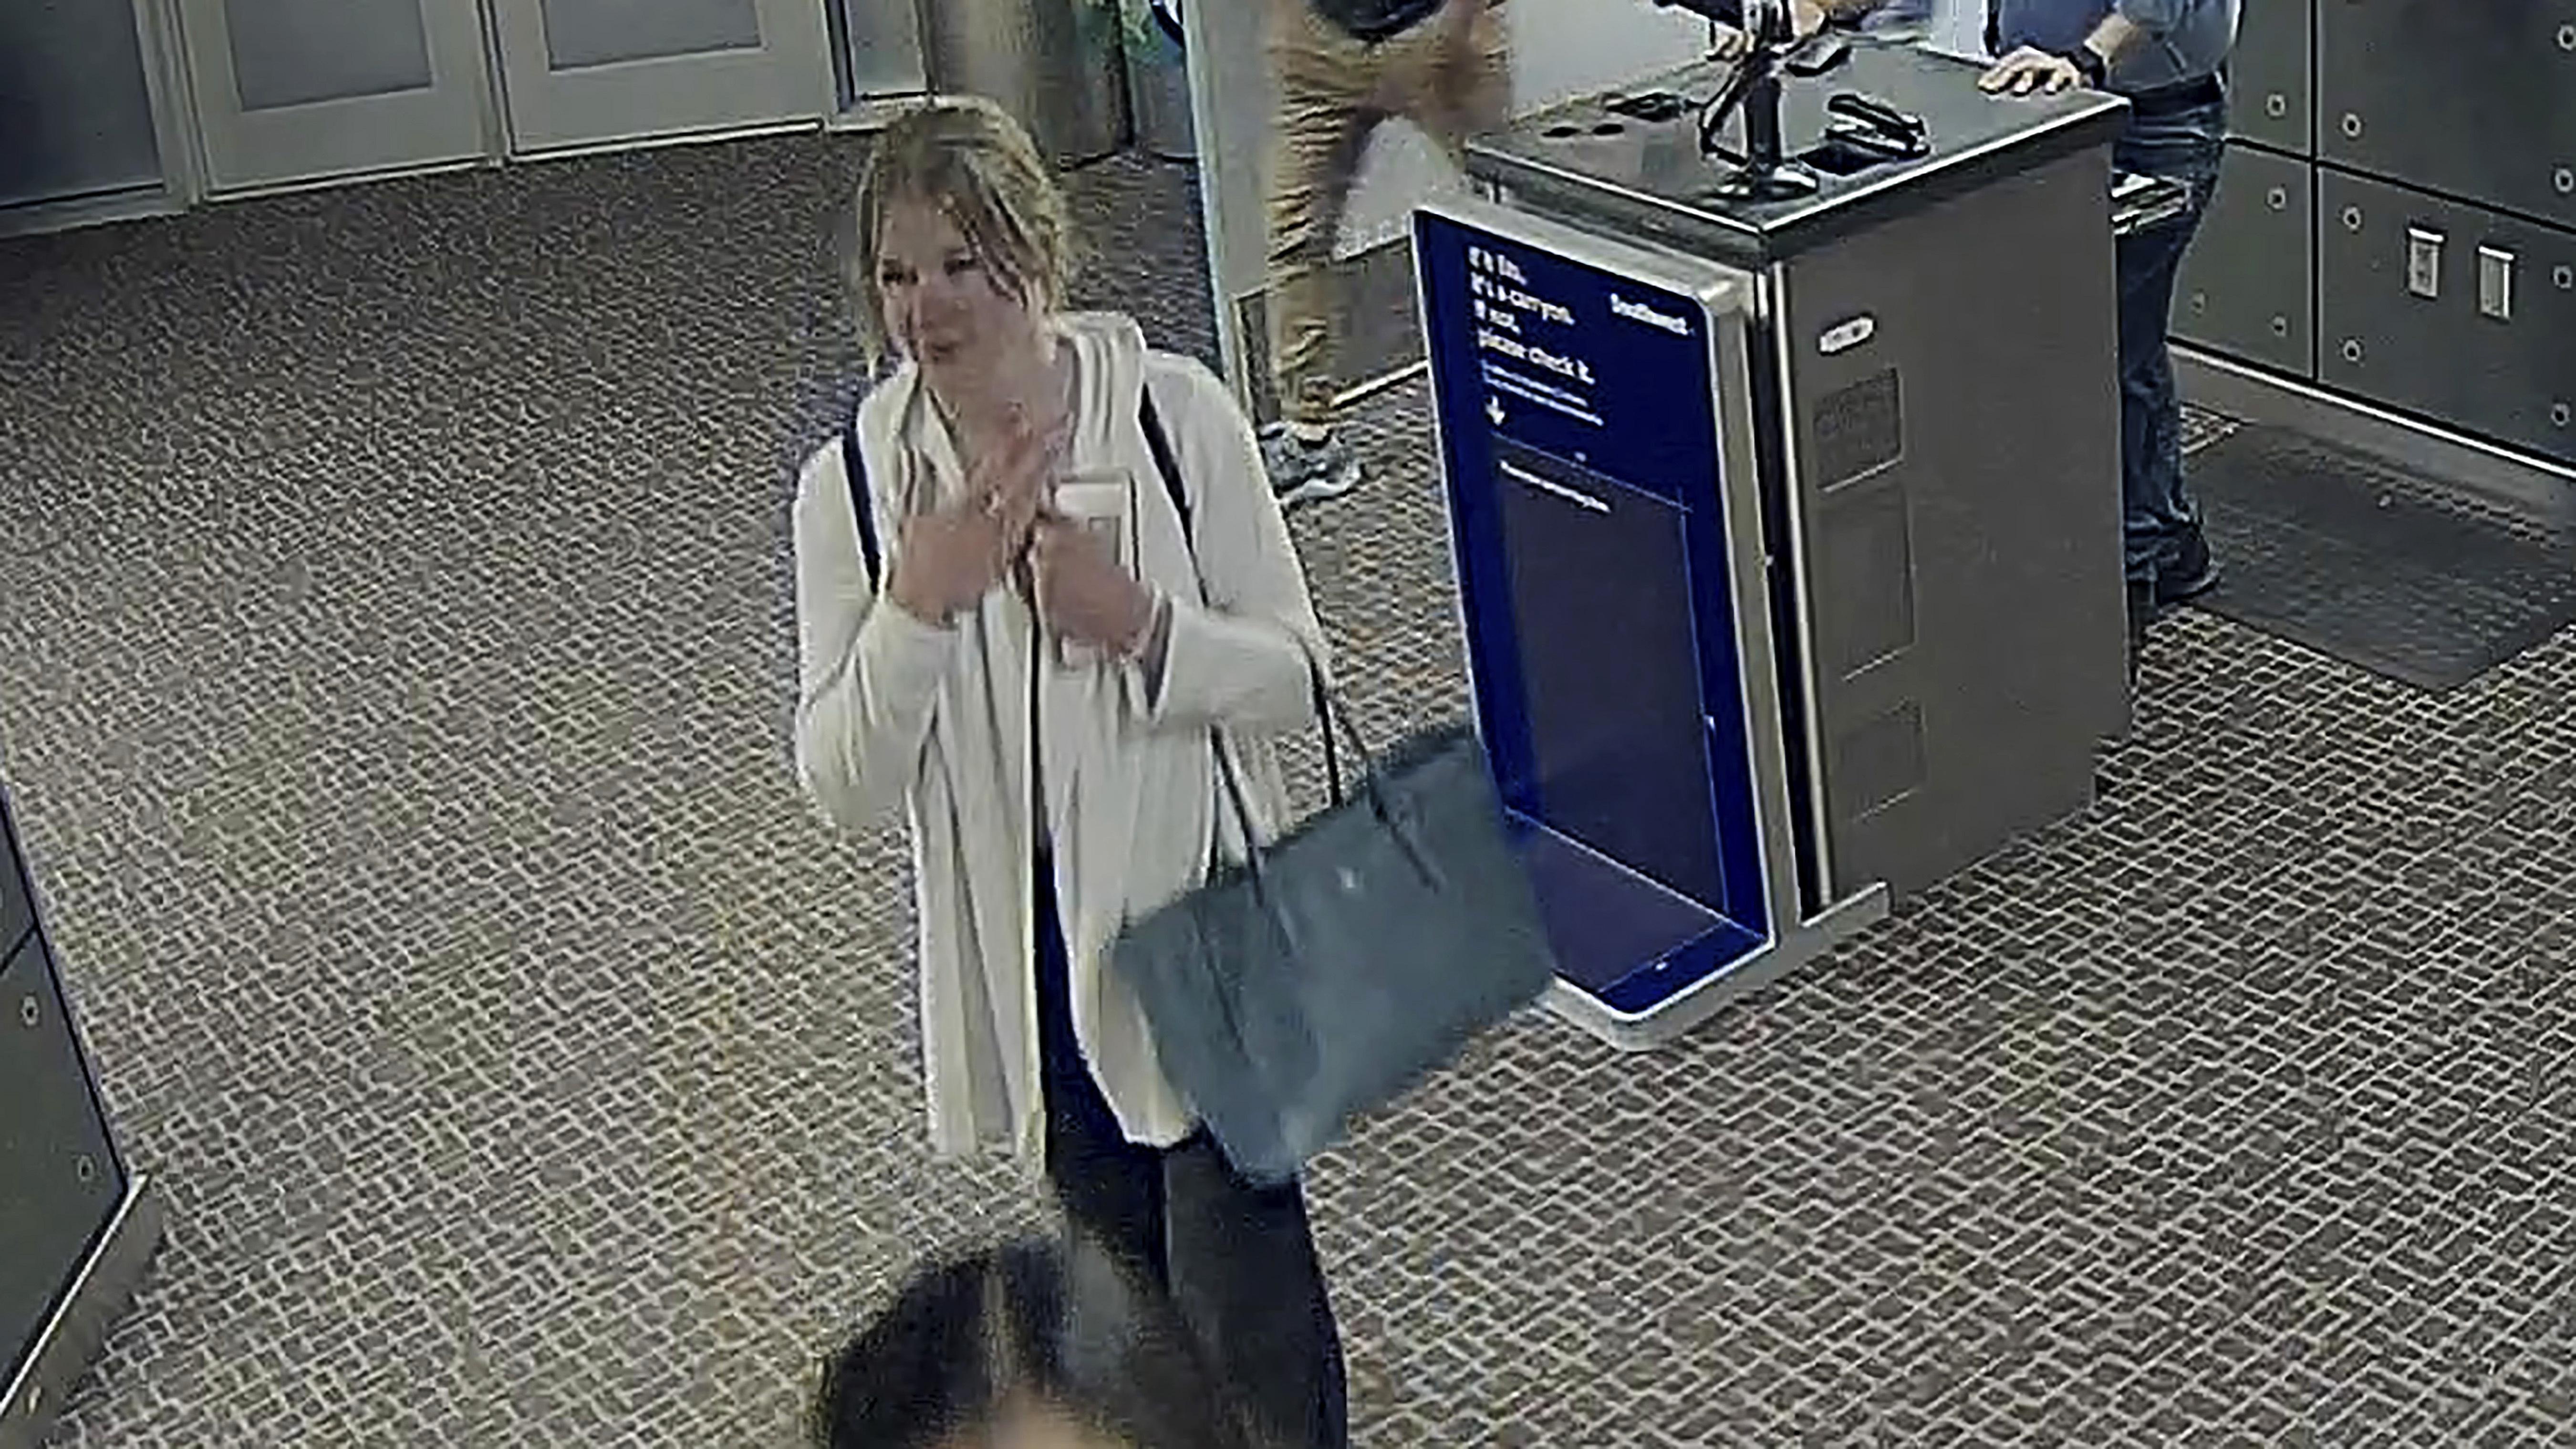 Police seek person who last saw missing Utah college student